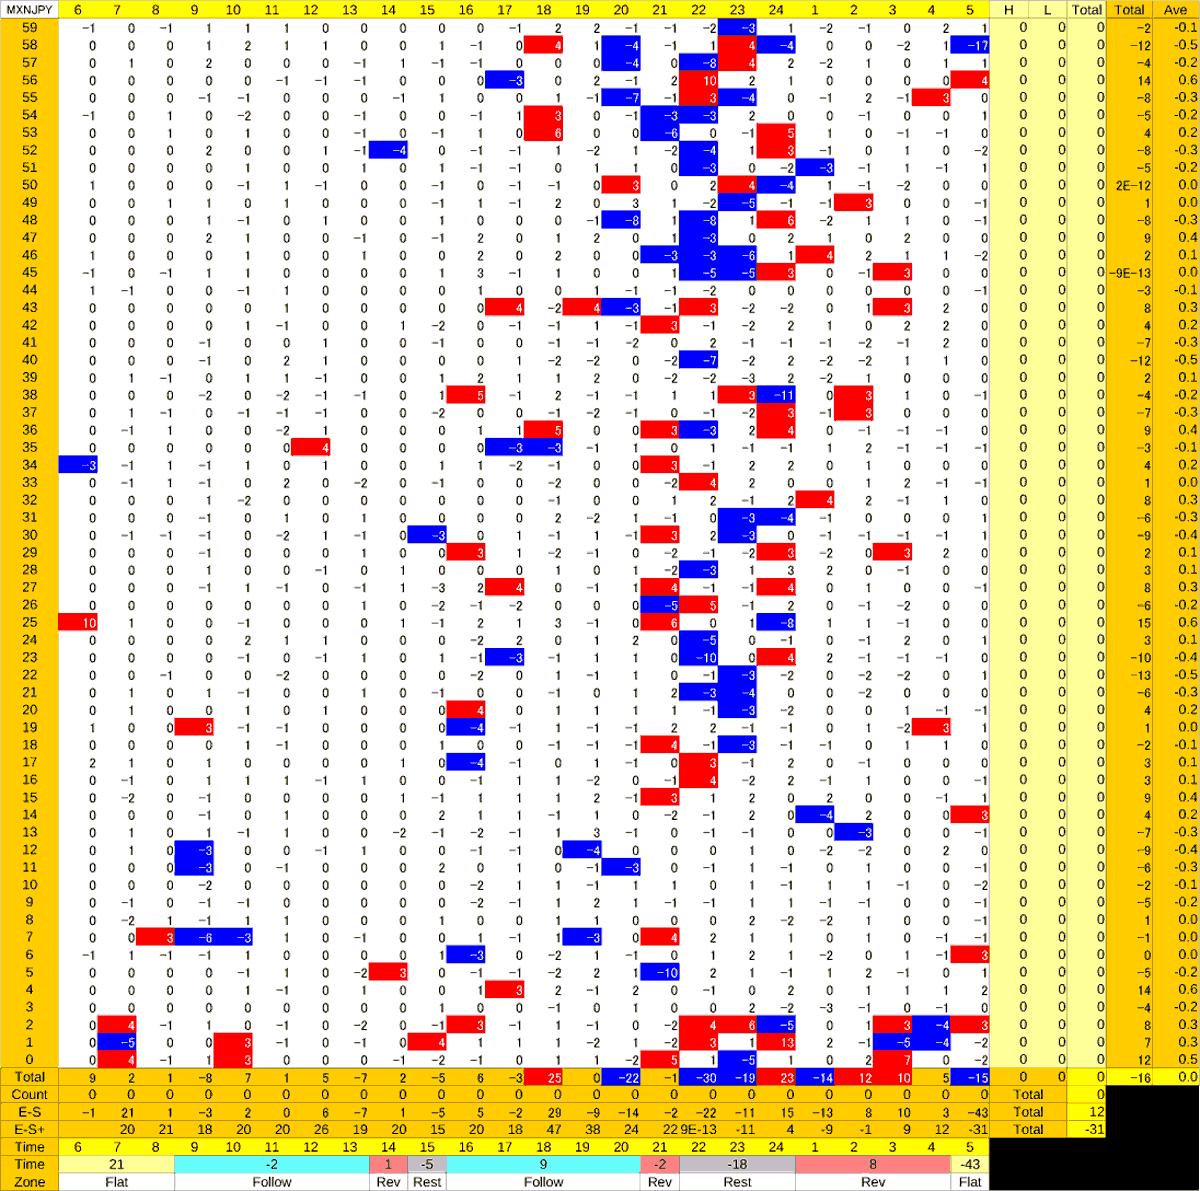 20200527_HS(3)MXNJPY